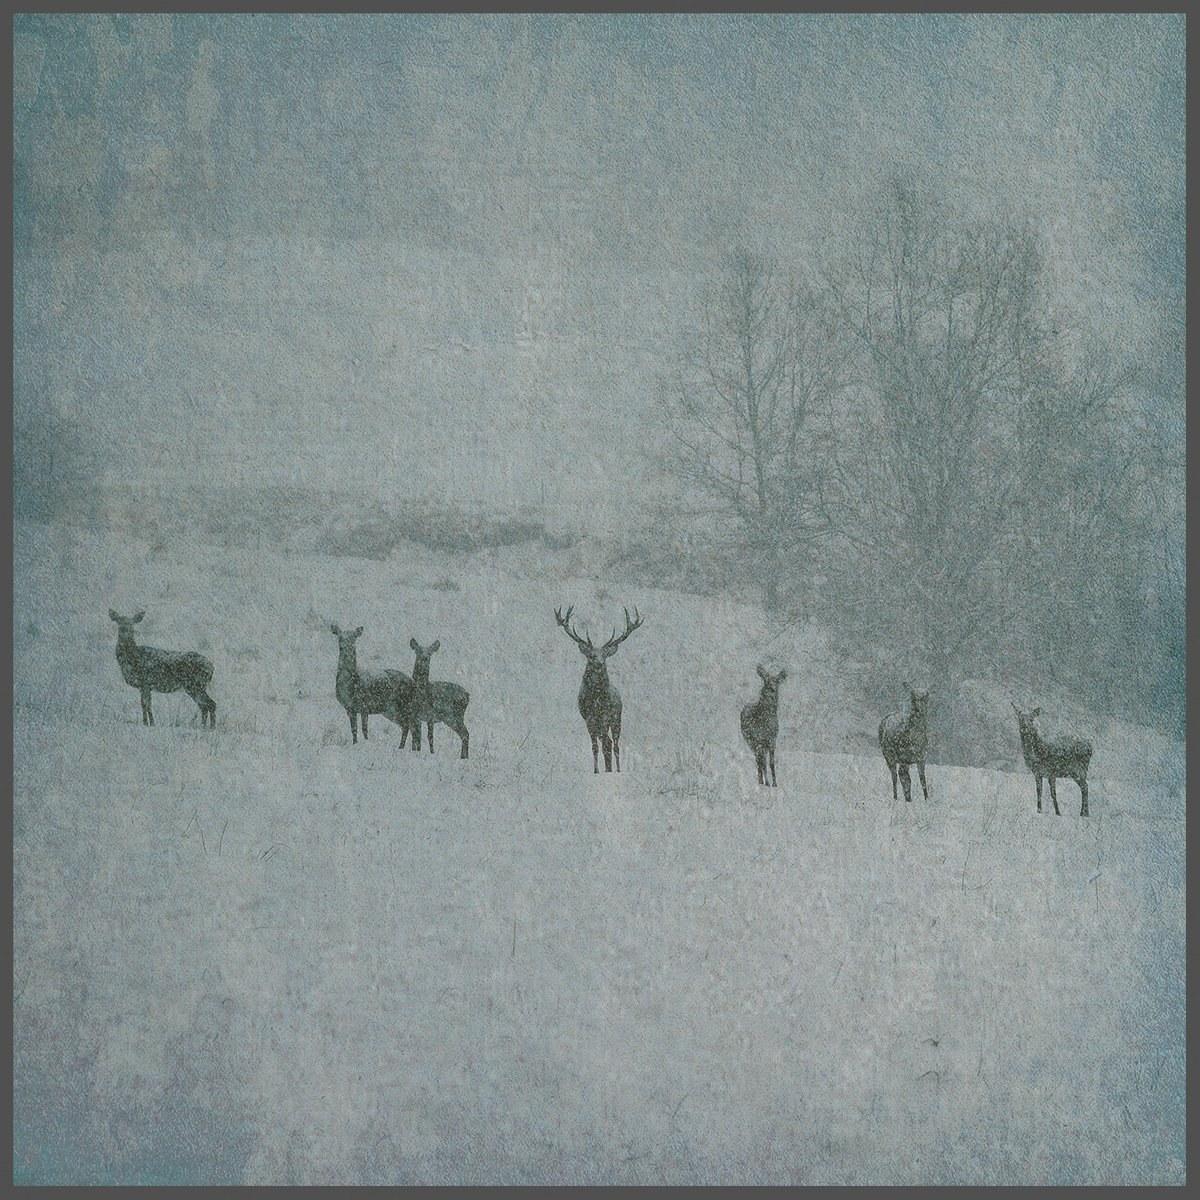 Rauhnåcht (AUT) - Winterstille